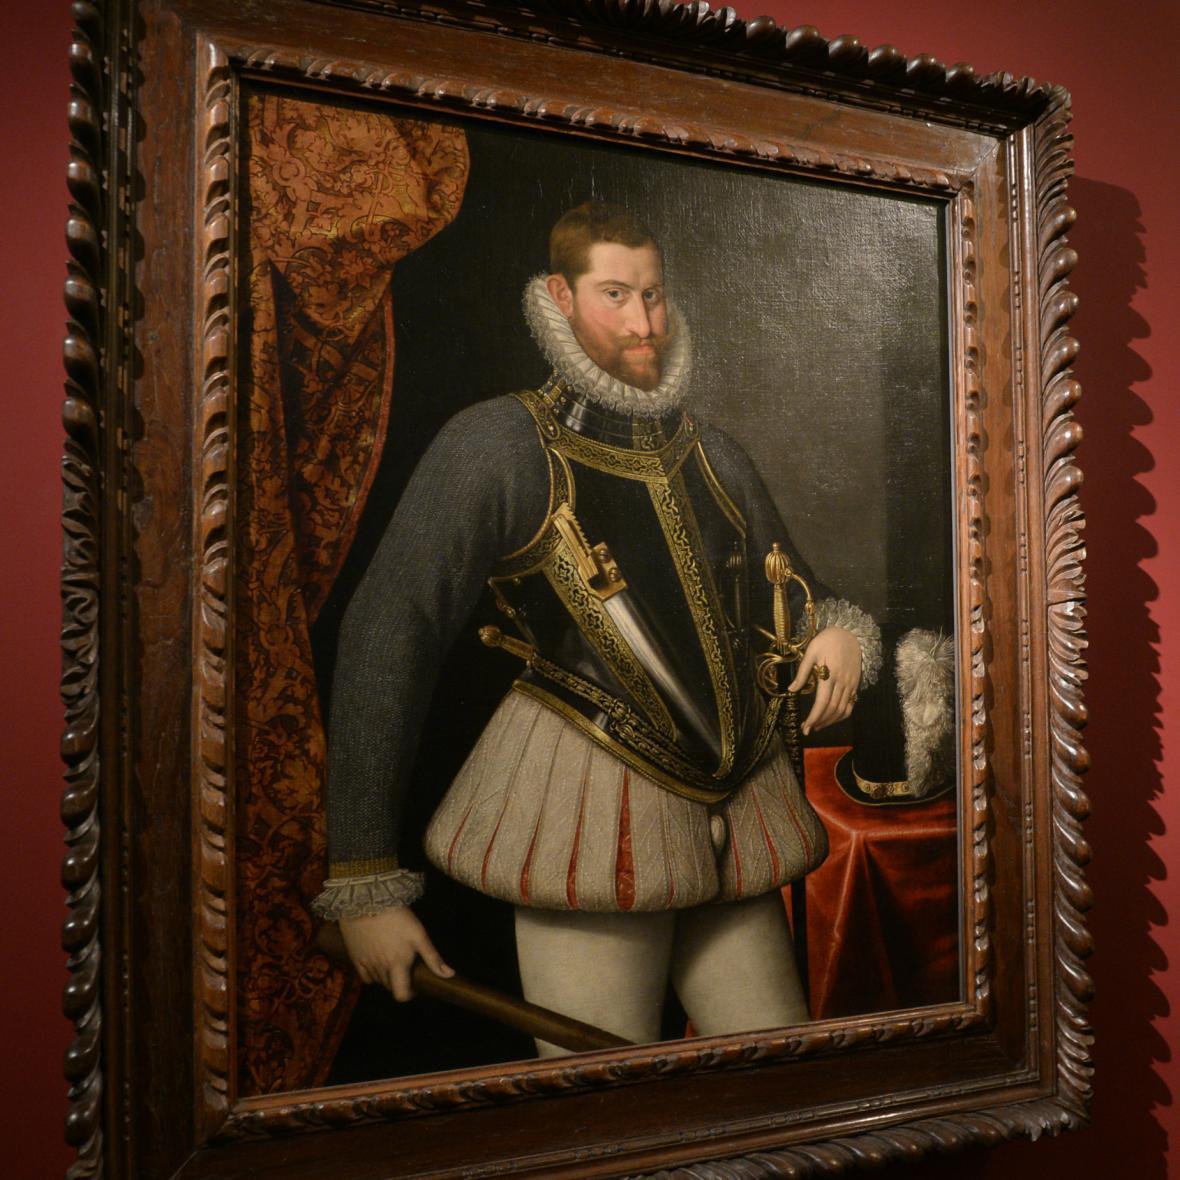 Portrét Rudolfa II. od Lucase van Valckenborcha